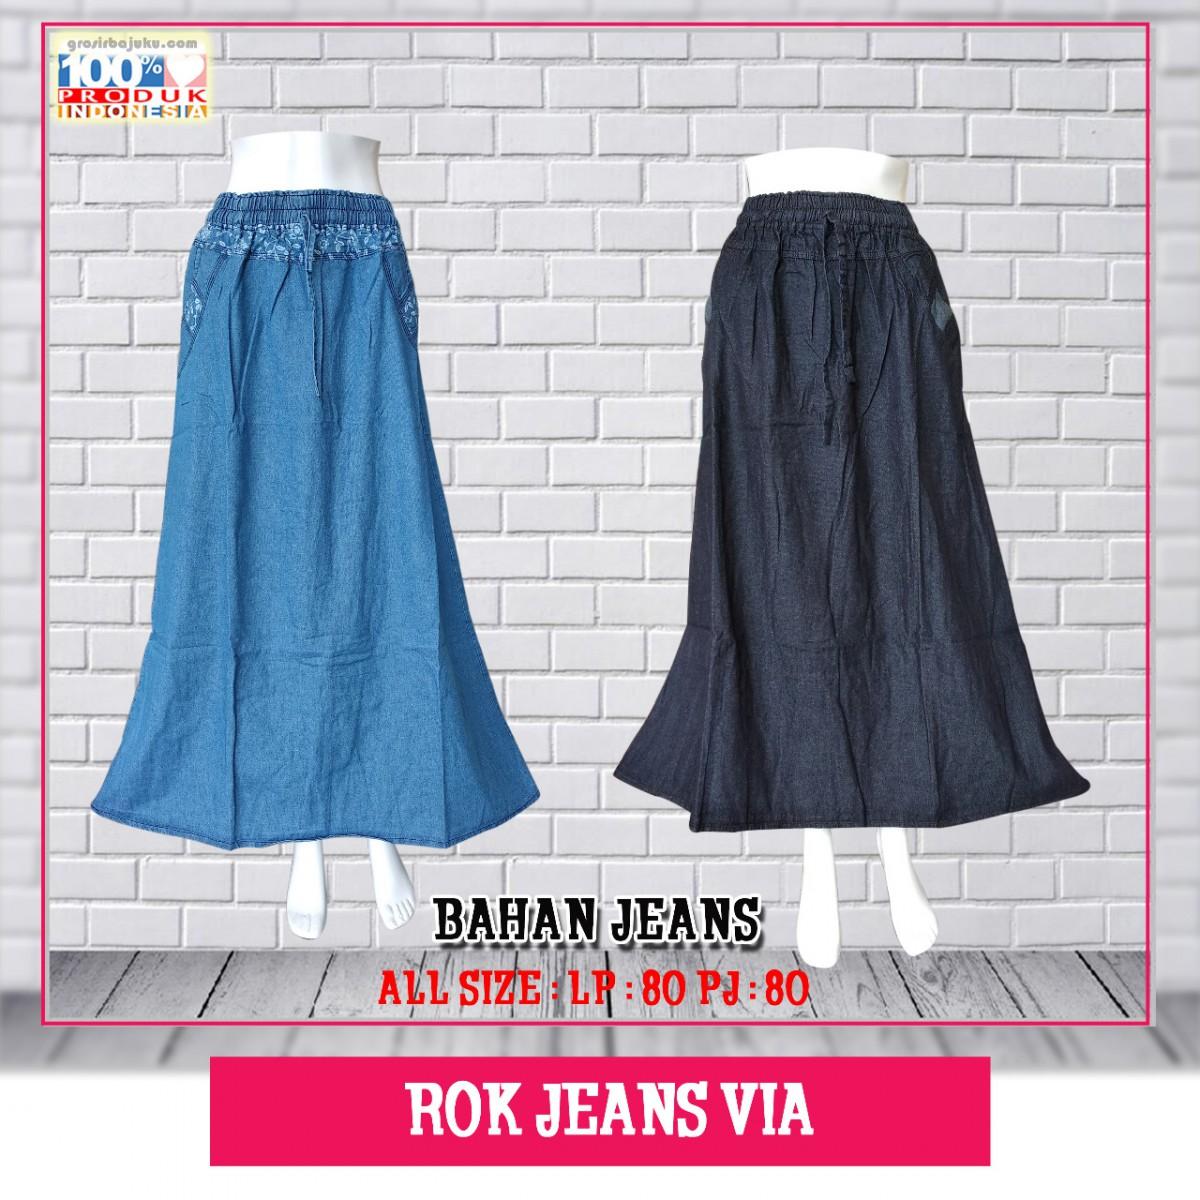 Pusat Obral Grosir Baju Anak 5000 Mukena Katun Jepang Murah Meriah Langsung Dari Pabrik Pusat Rok Jeans Via Rp 50,000